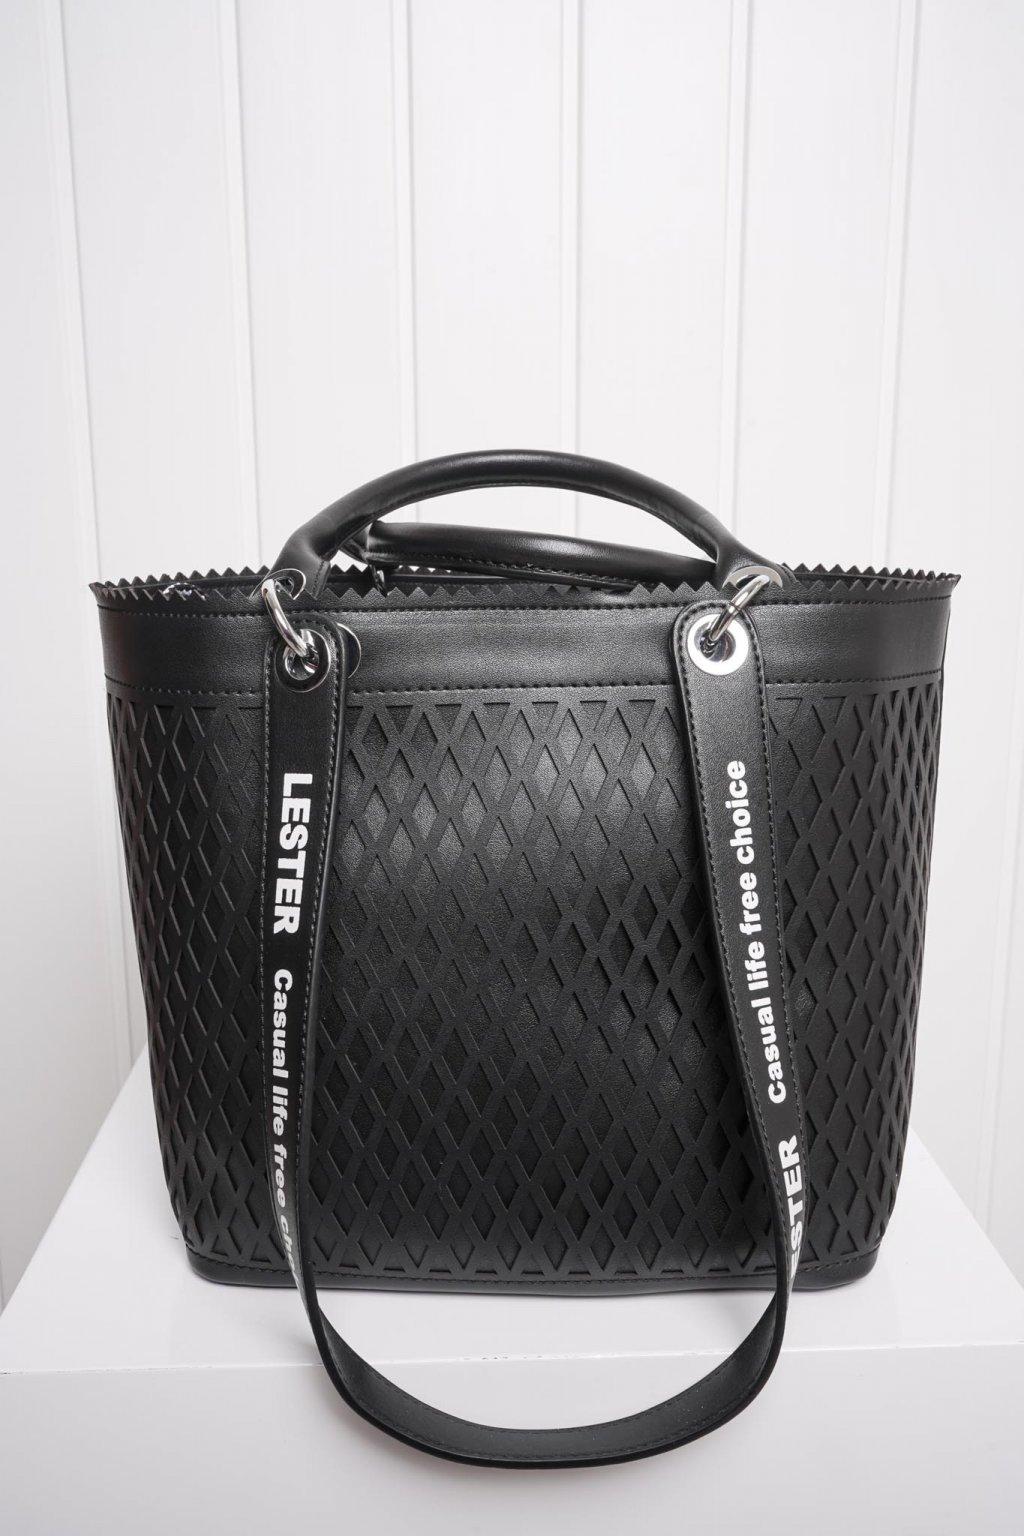 Kabelka, ruksak, dobrá cena, čierna kabelka, čierny ruksak, basic, kabelky, ruksaky 047